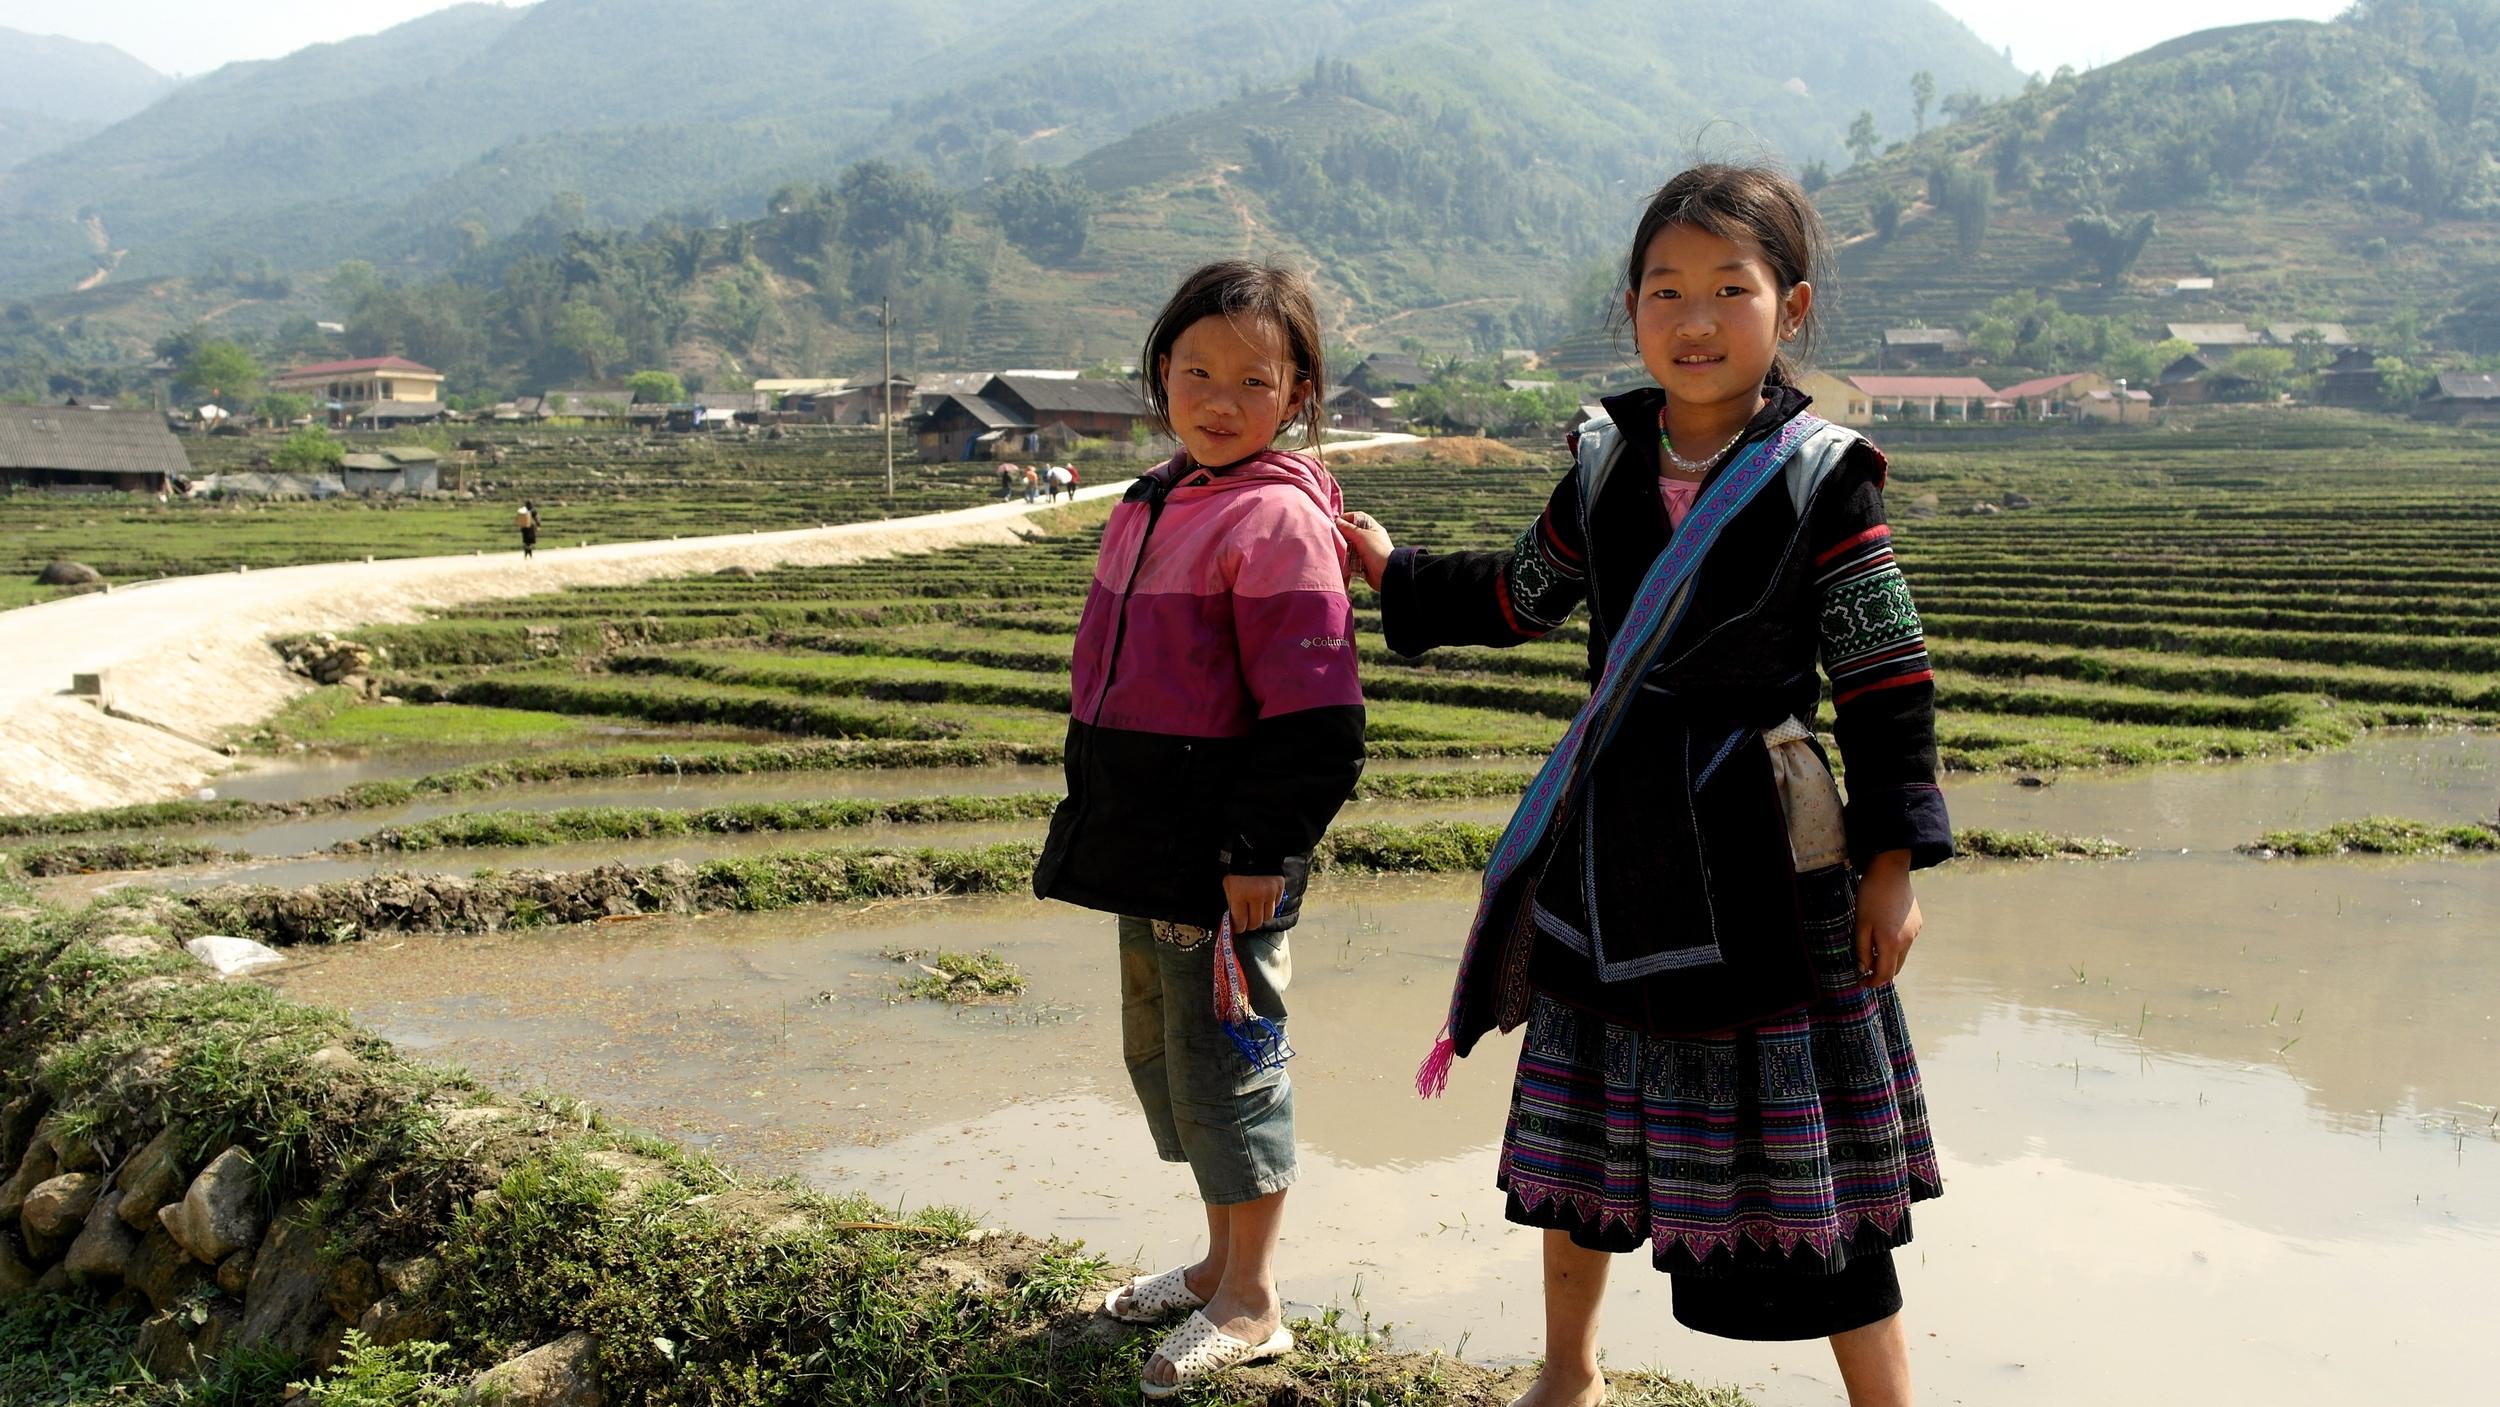 black hmong girls near the vietnamese town of sapa